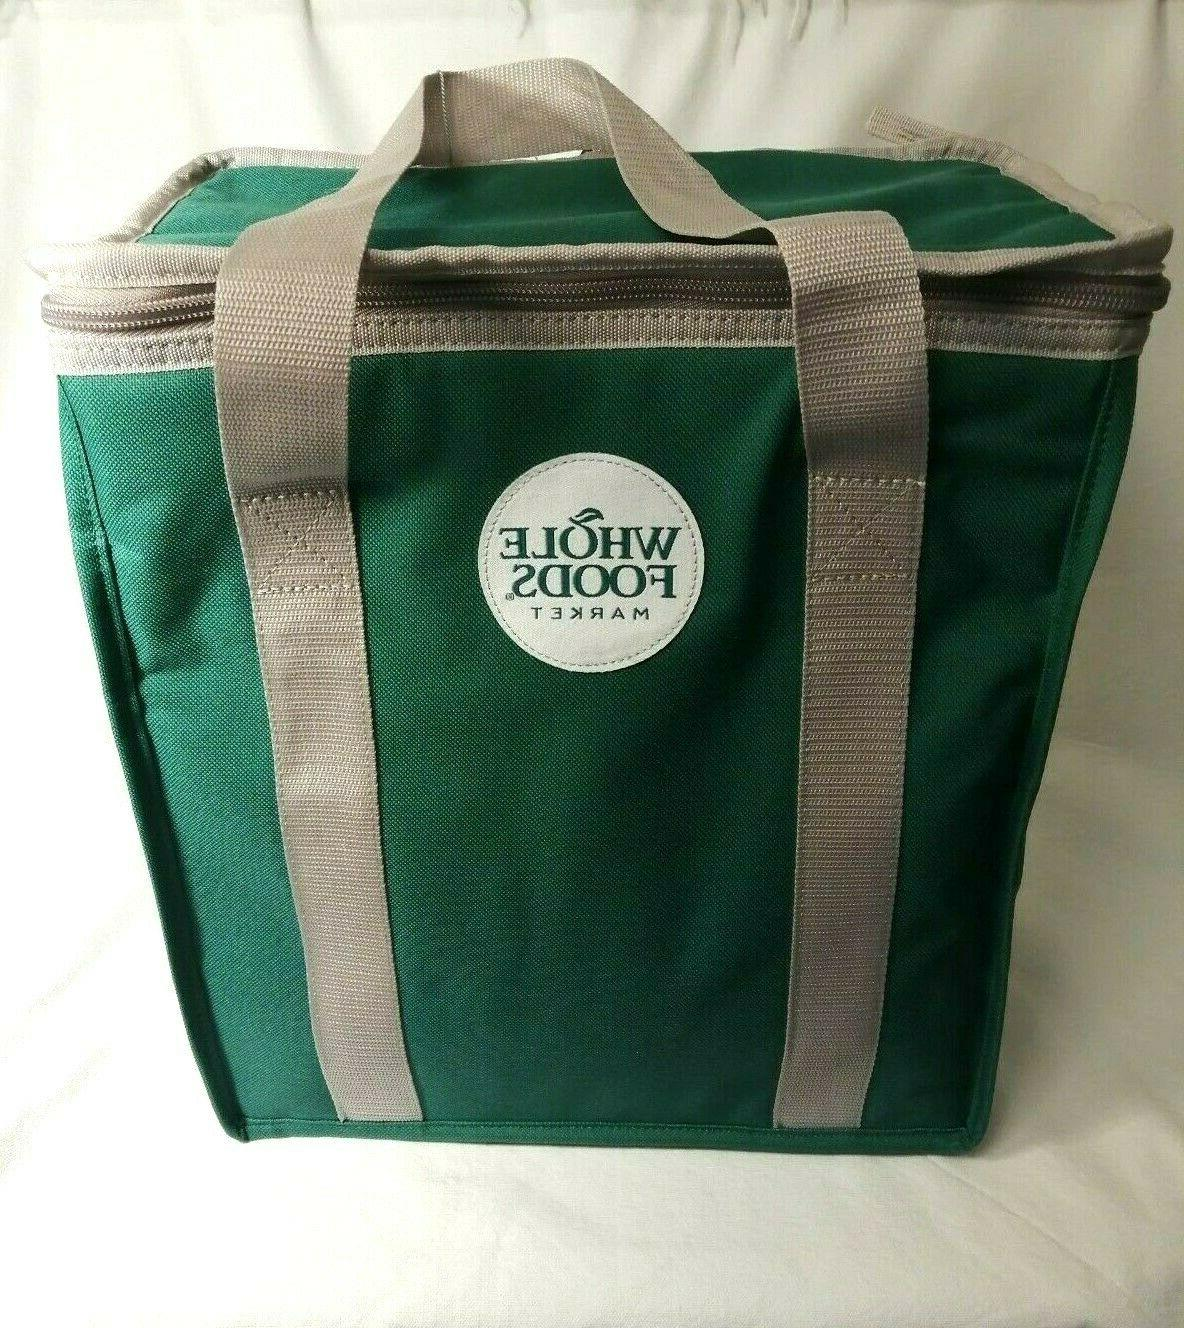 nwt market reusable insulated cooler green shopping